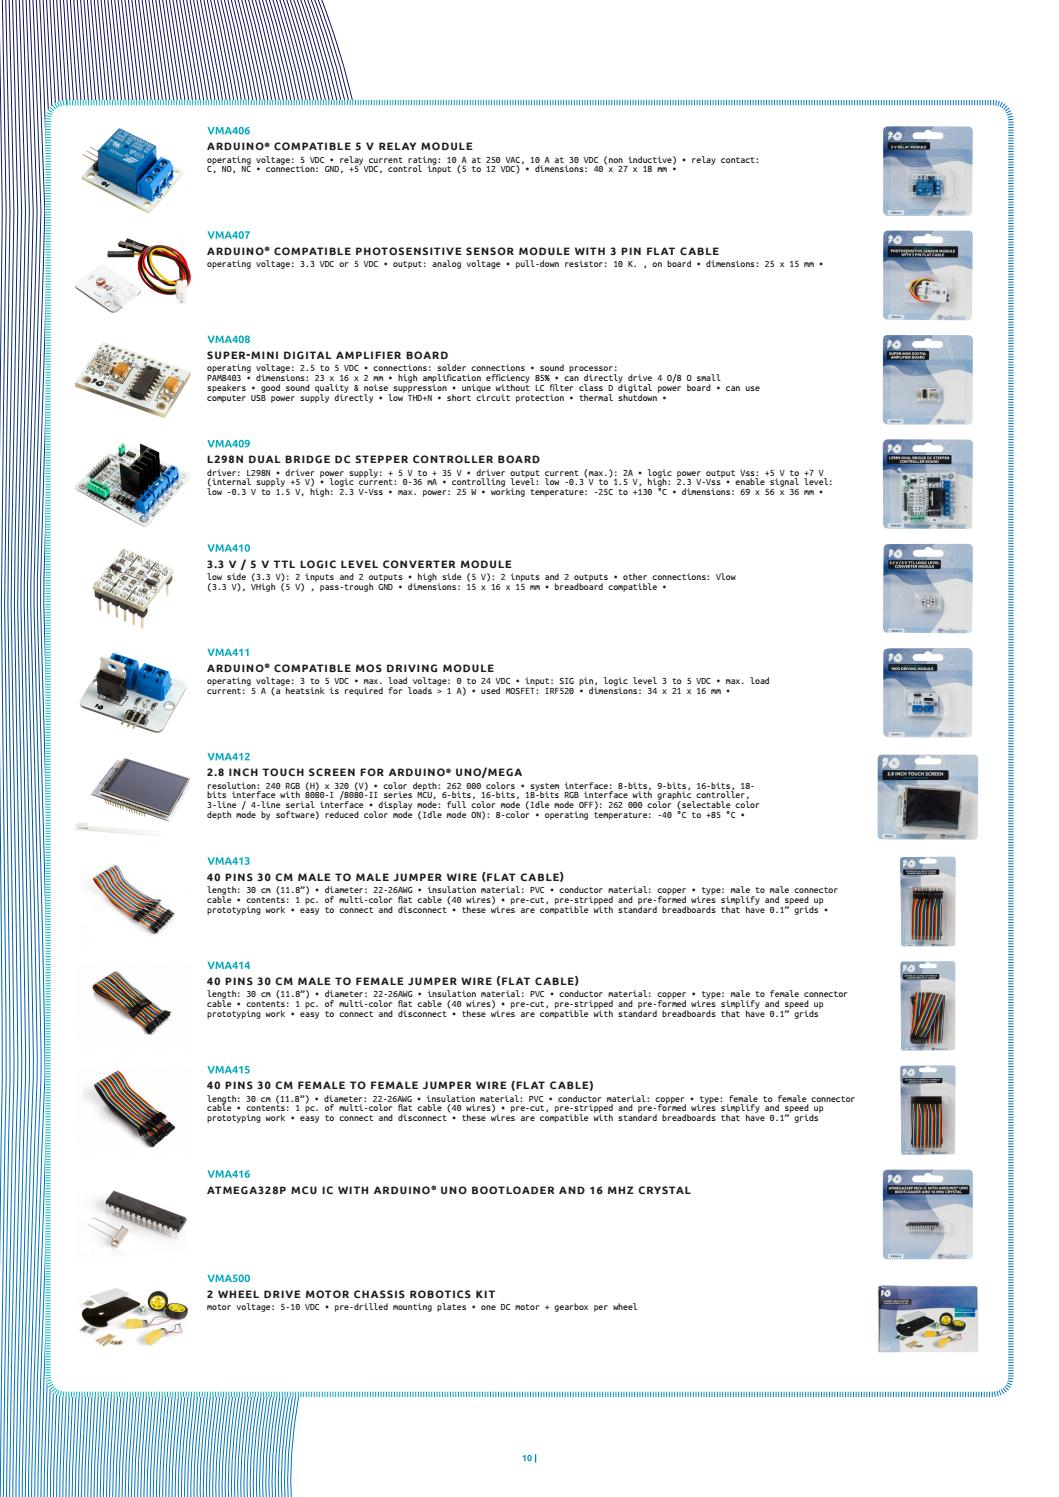 30 Multi-Colour Velleman VMA414 40 Pins Male To Female Flat Cable Jumper Wire